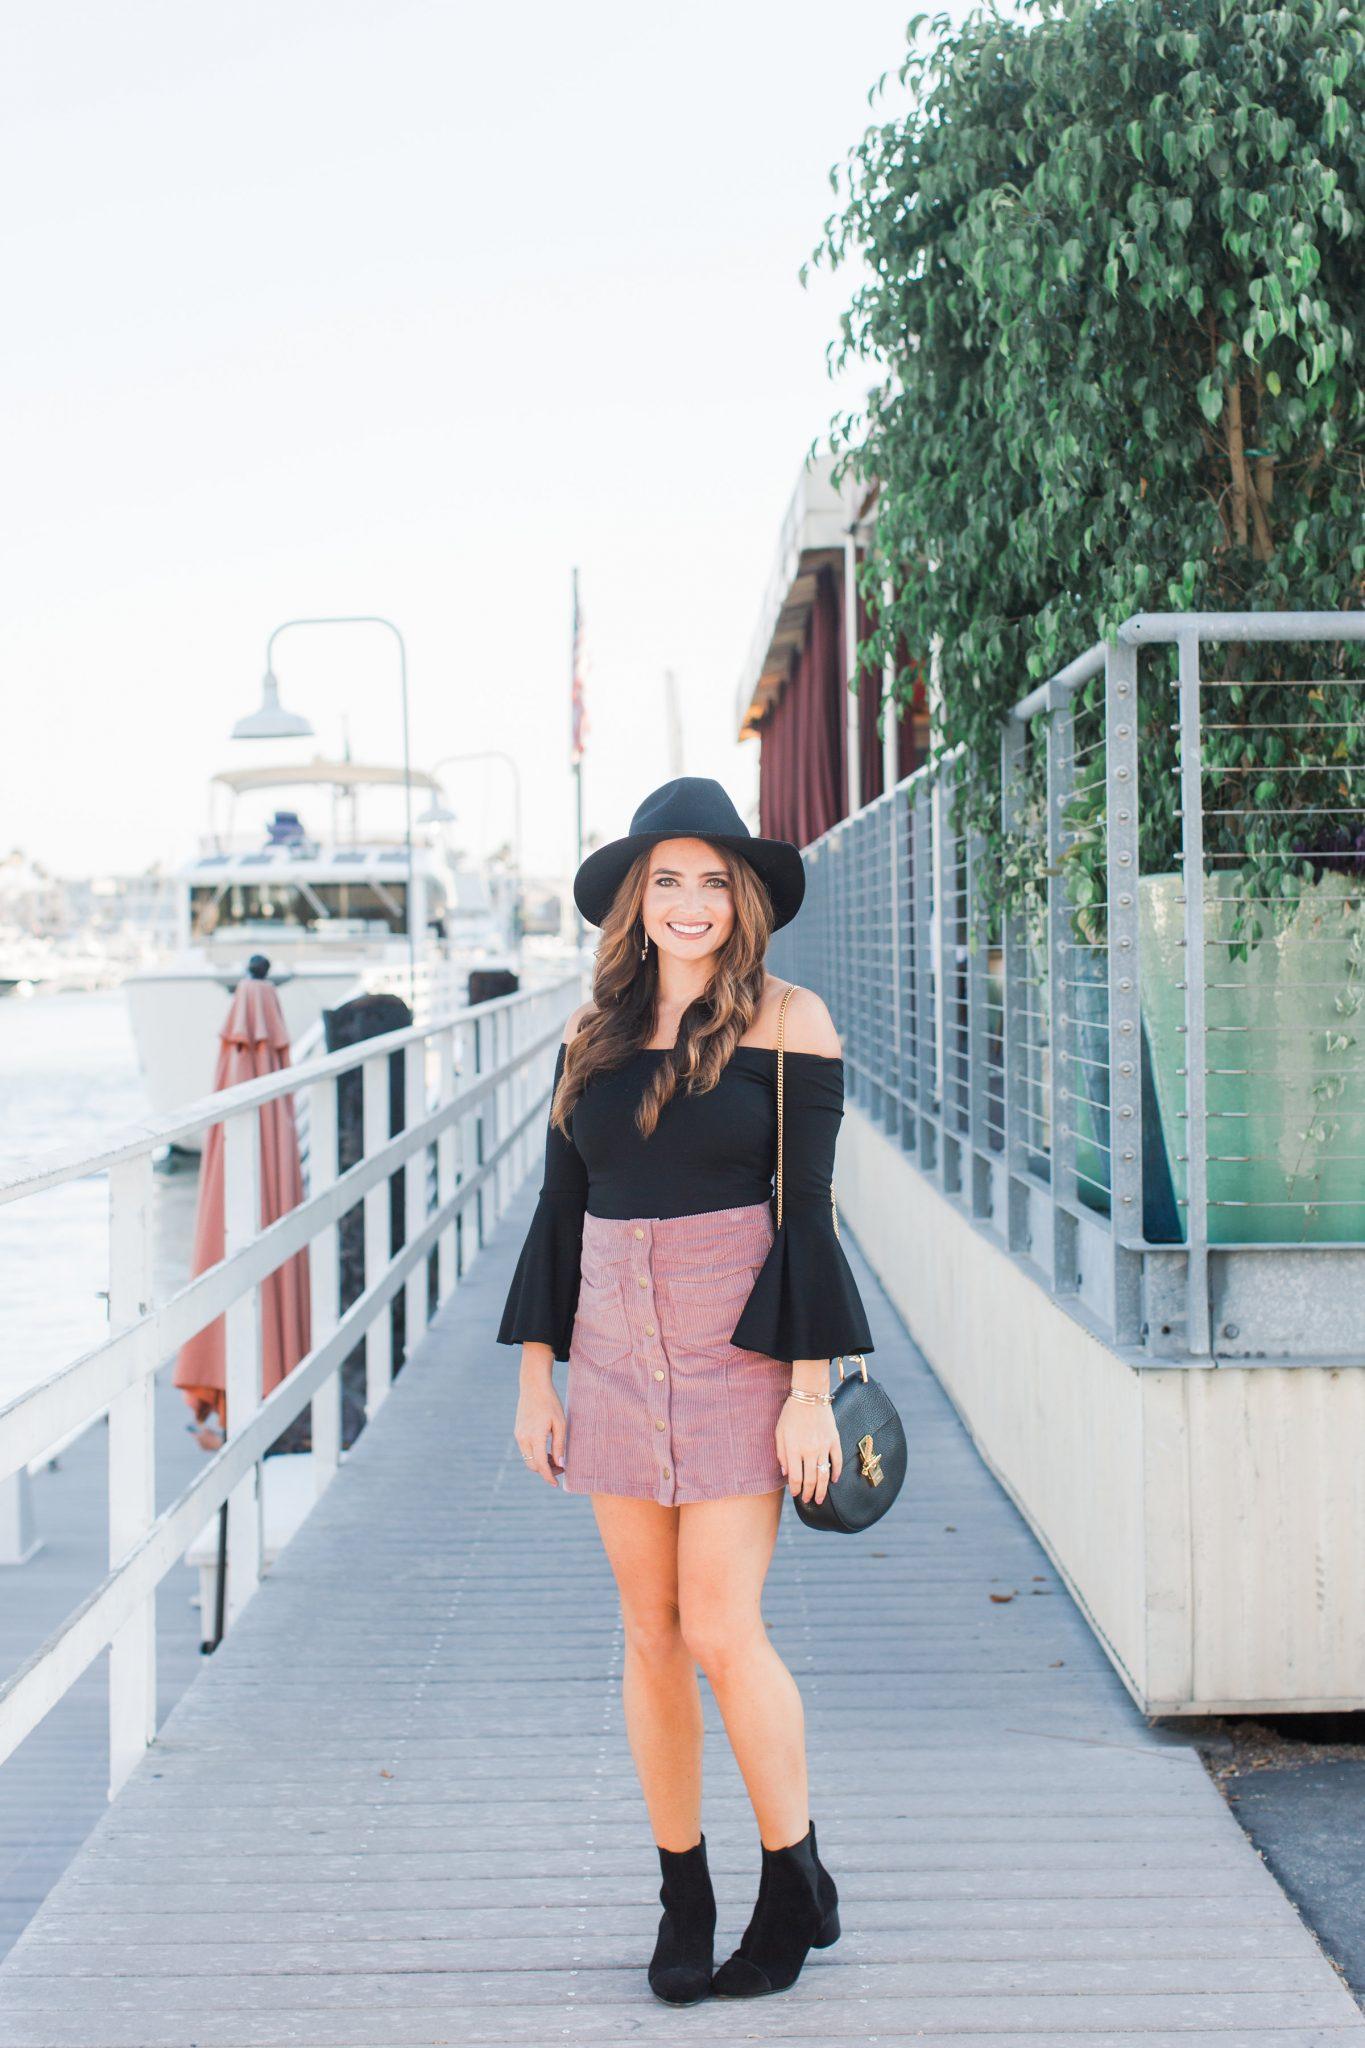 Maxie Elle | Corduroy Mini skirt styled by popular Orange County fashion blogger, Maxie Elle